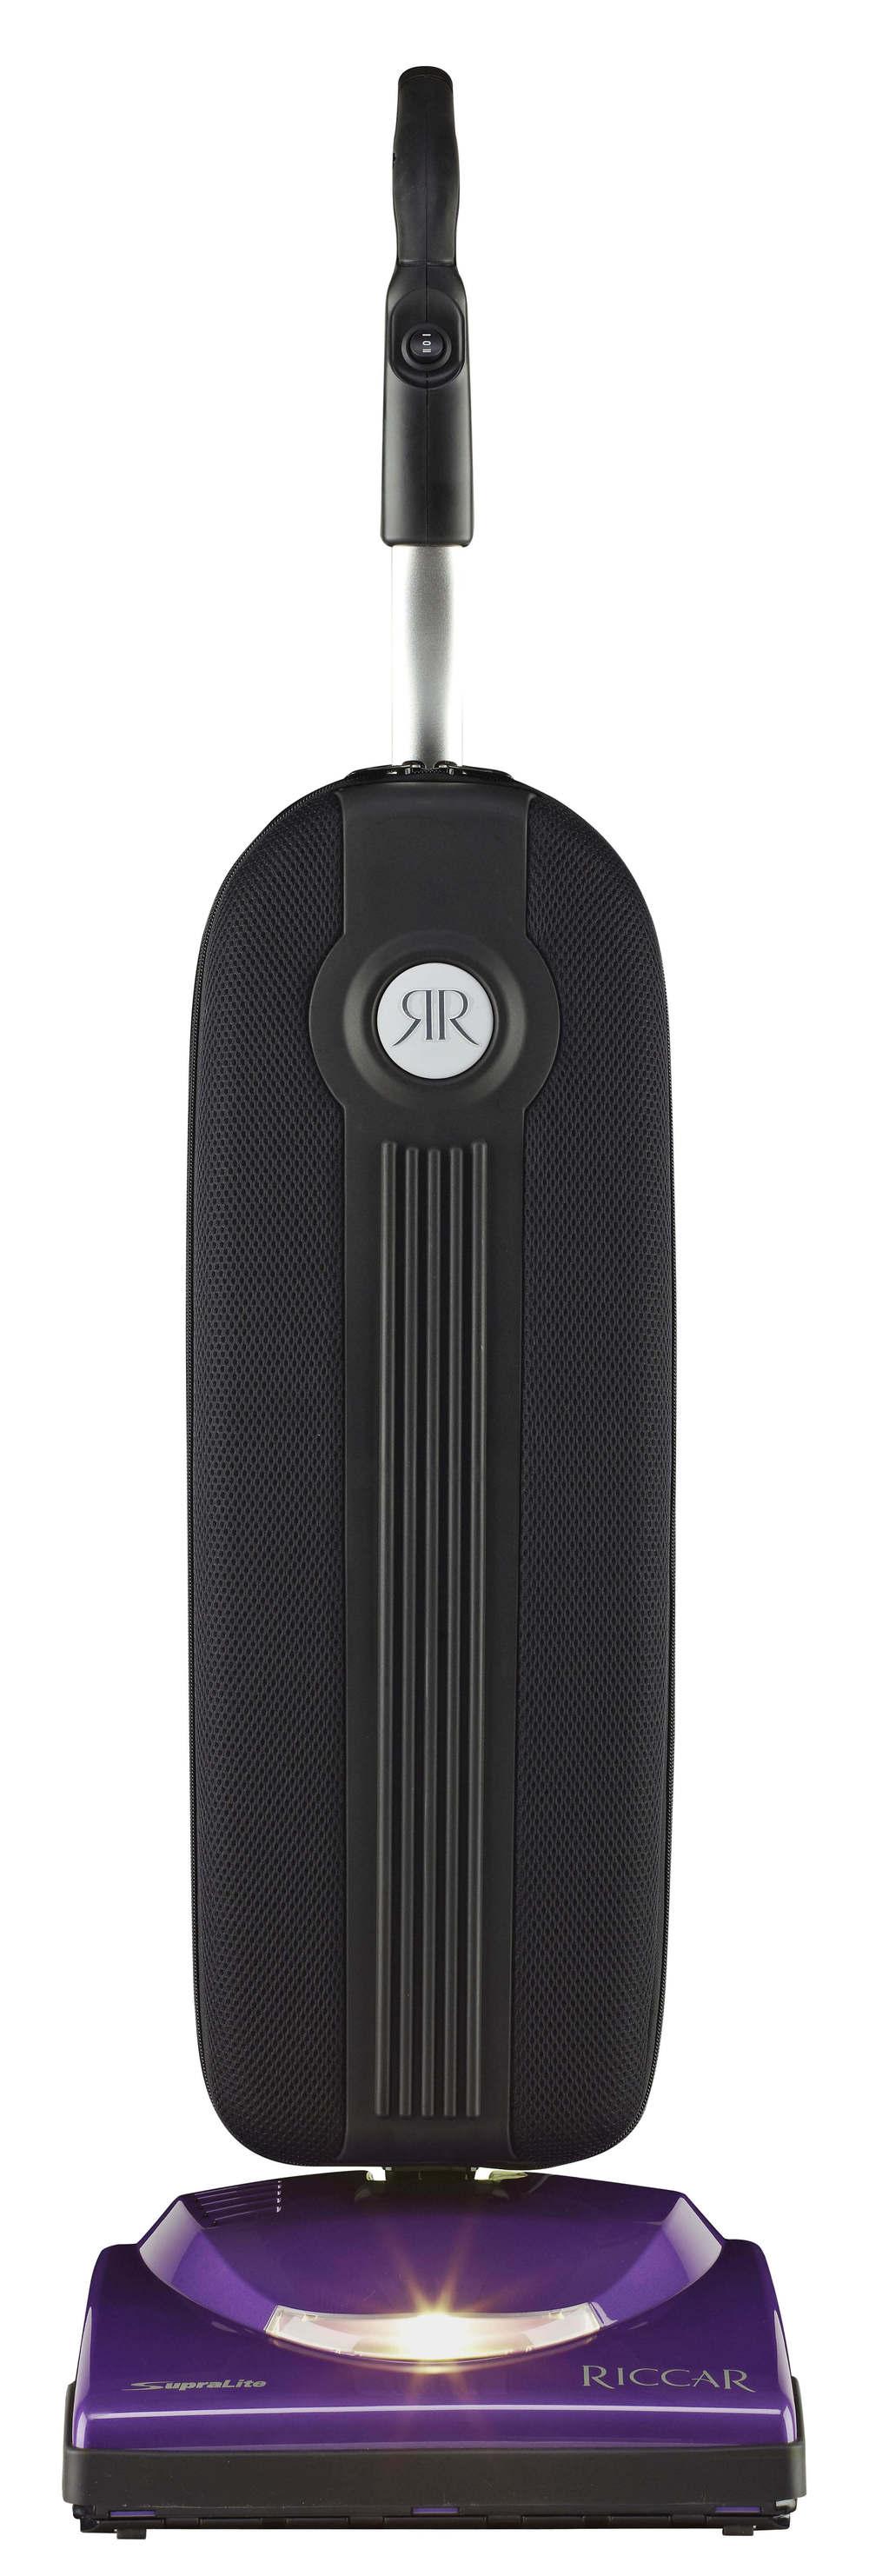 SupraLite Standard R10S Riccar